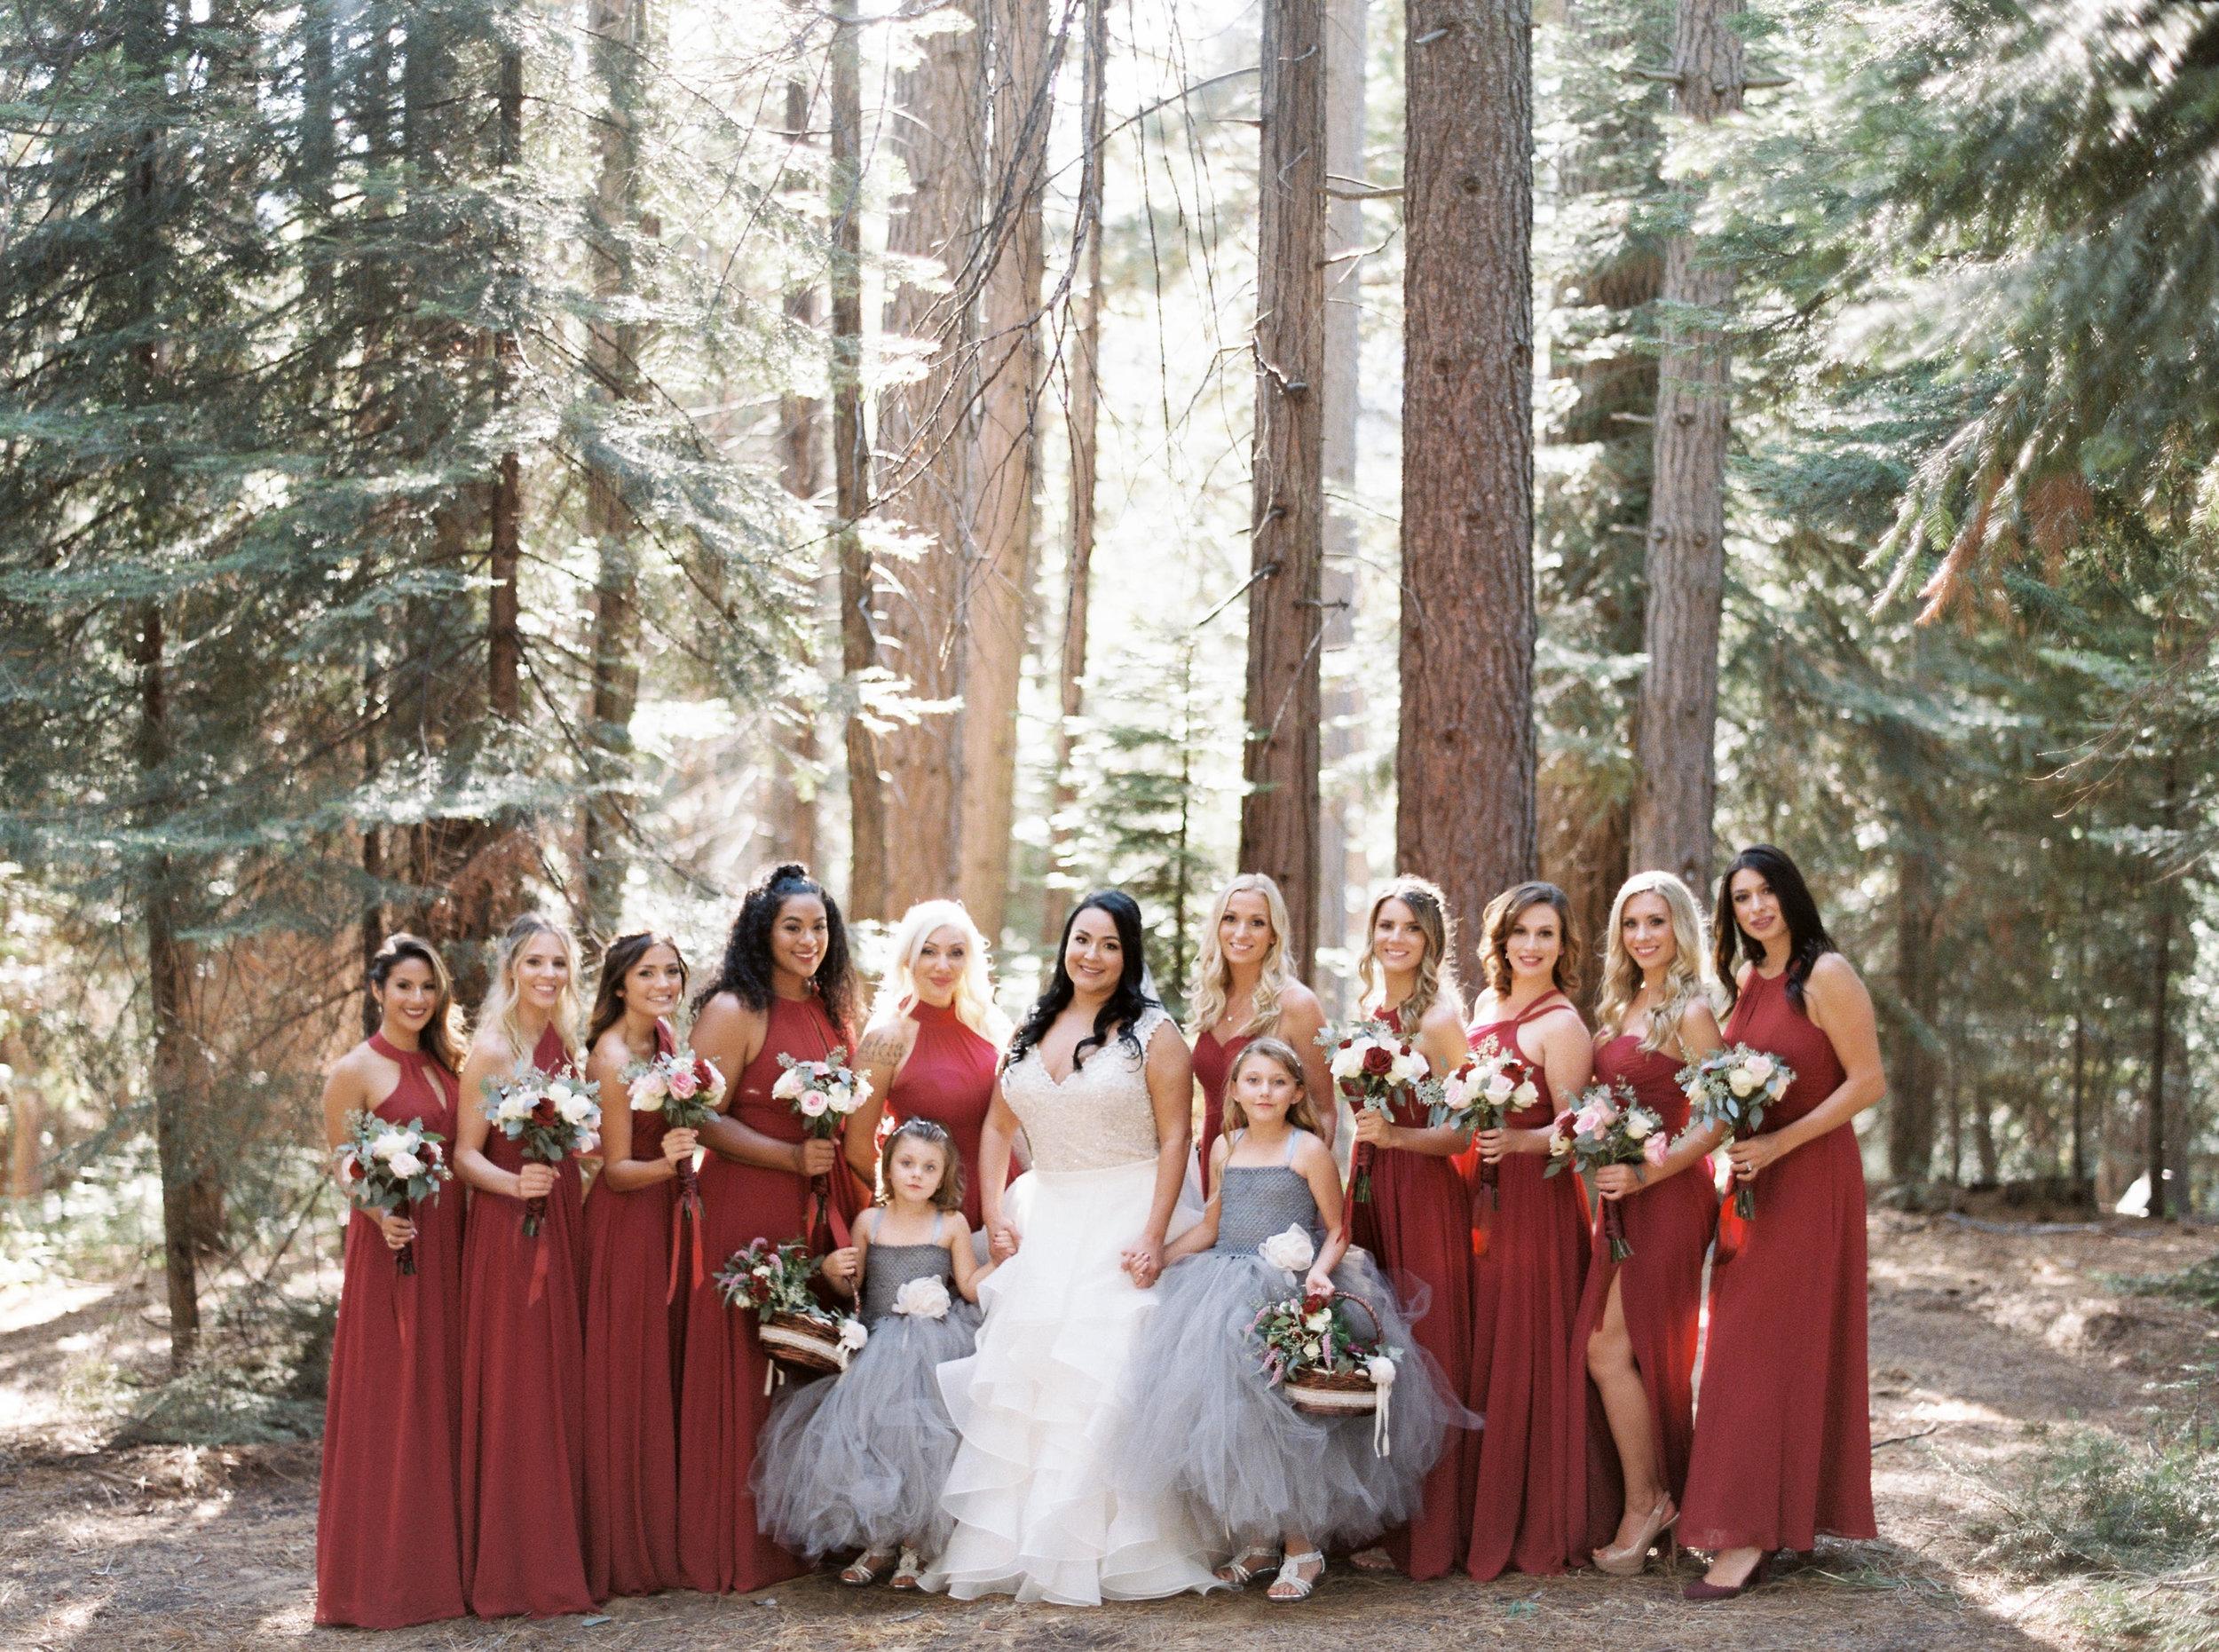 Tenaya-lodge-wedding-at-yosemite-national-park-california-46.jpg